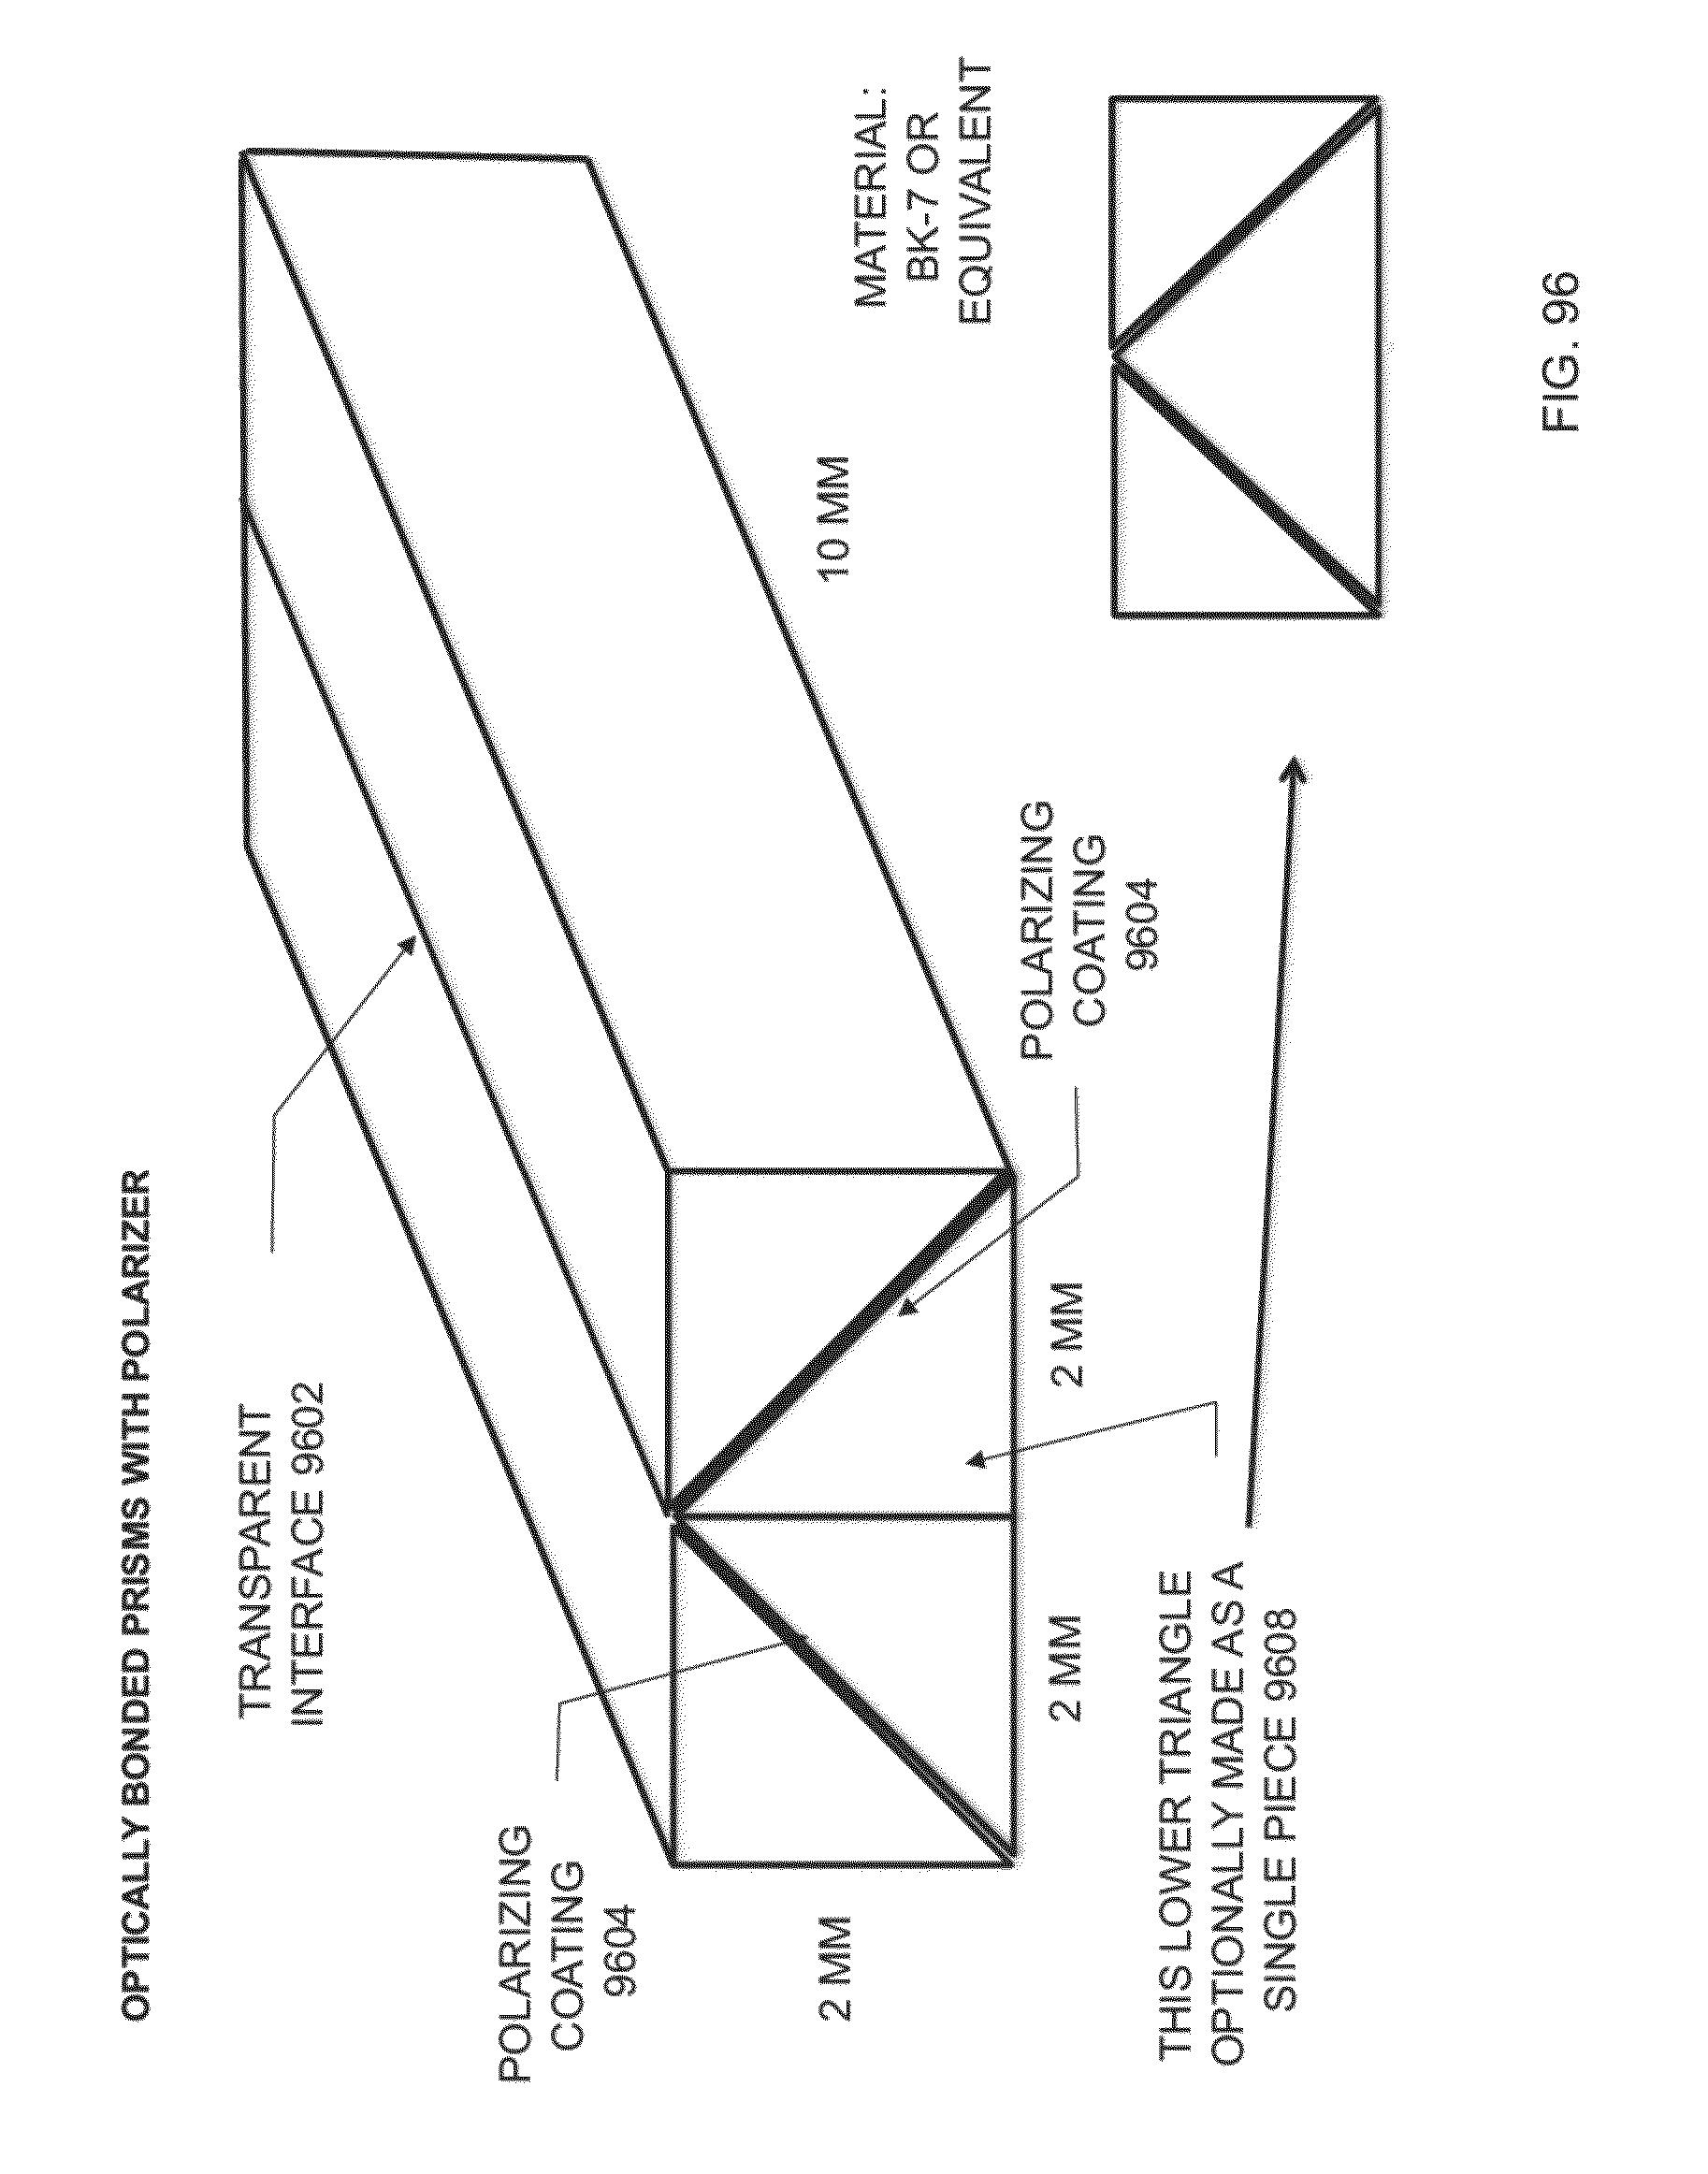 patent us 9 097 890 b2 208 Volt Motor Wiring Diagram patent images